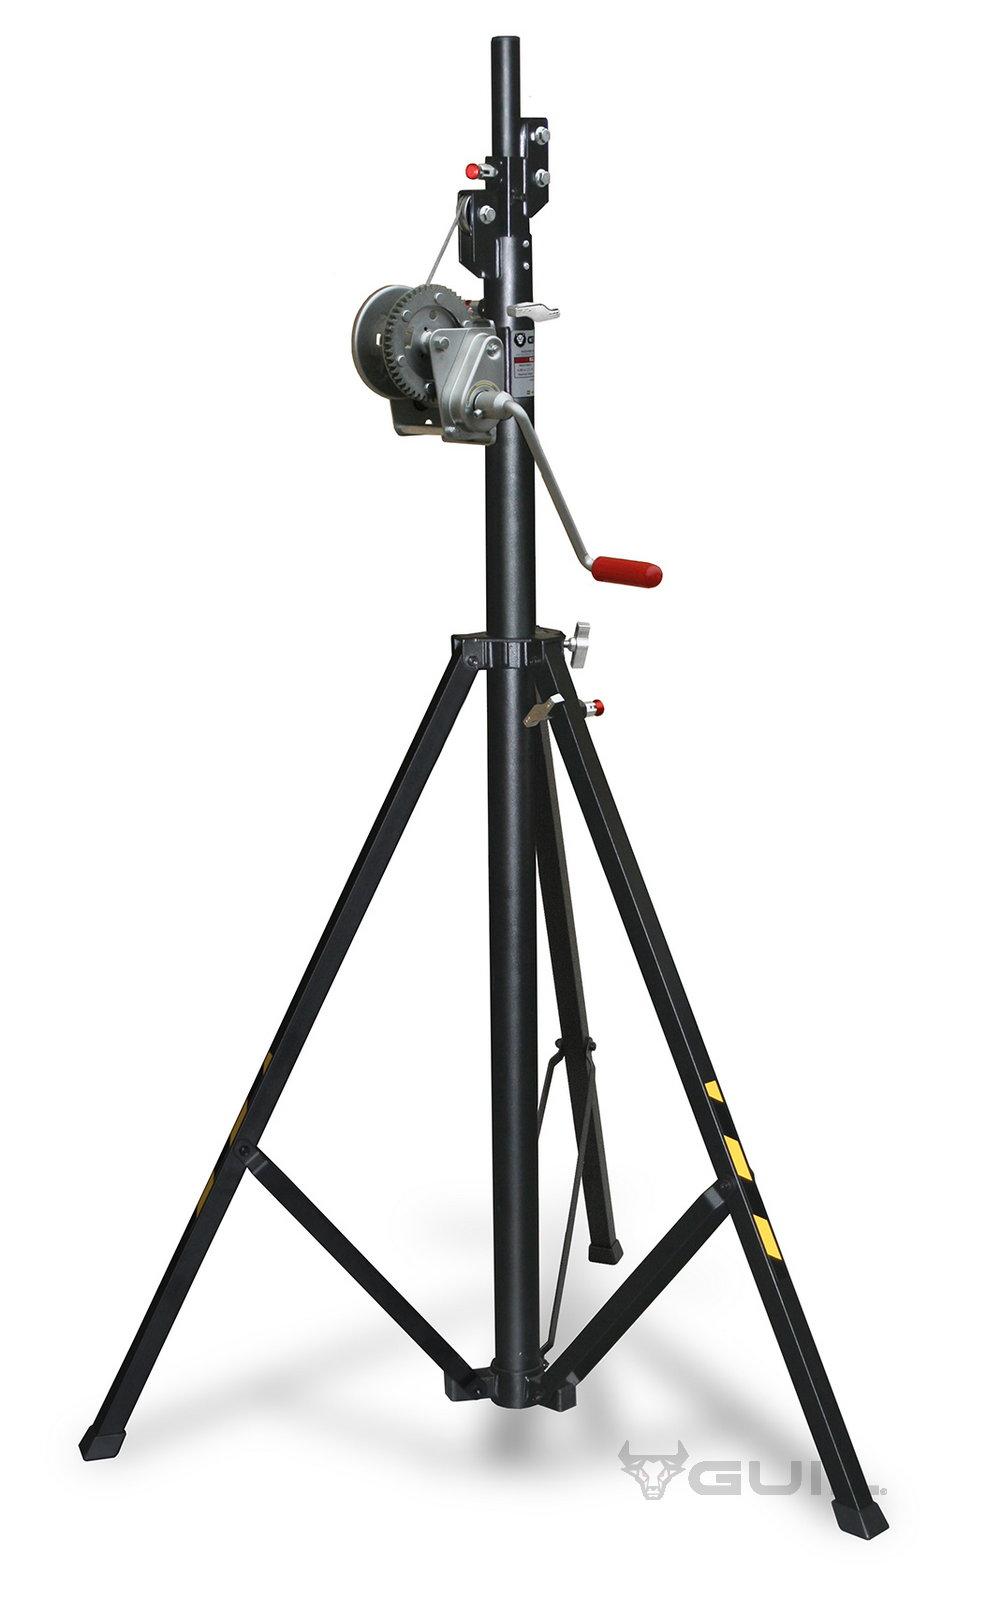 Materiaallift 1,7-4,0 m 100 kg (dutch) (1)